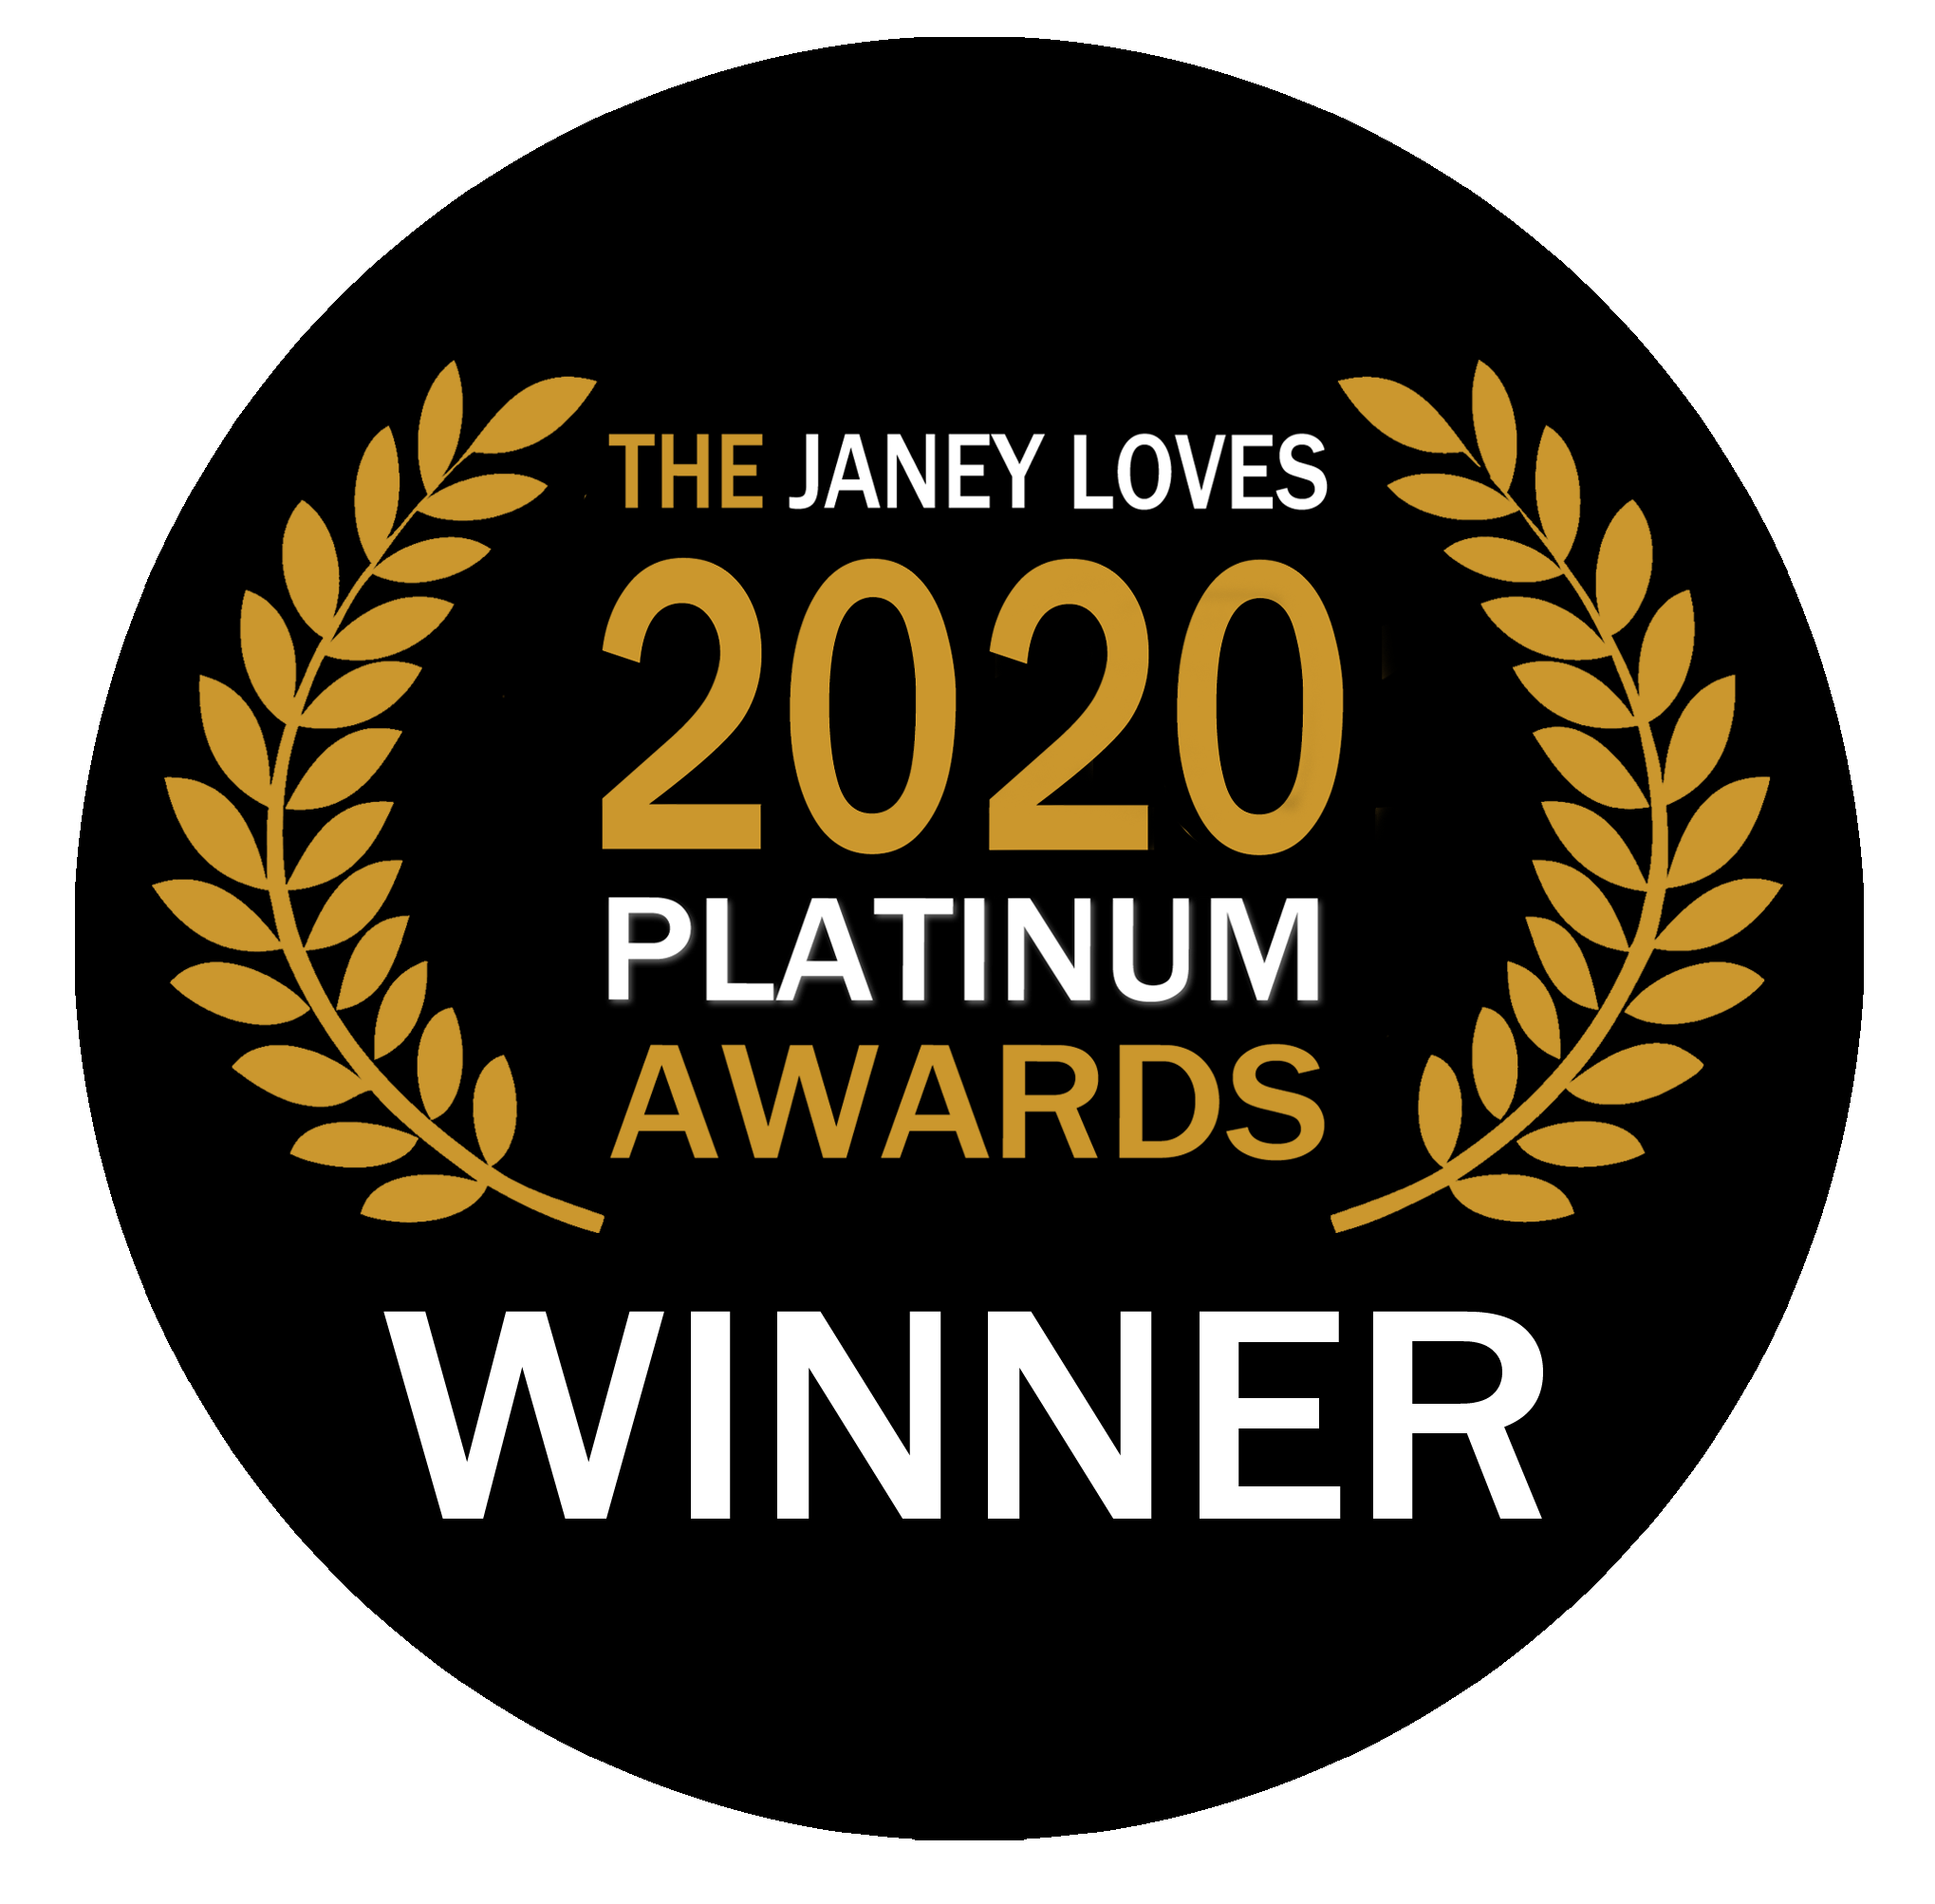 Winner of the 2019 Janey Loves PLATINUM AWARD Best Home EMF protection